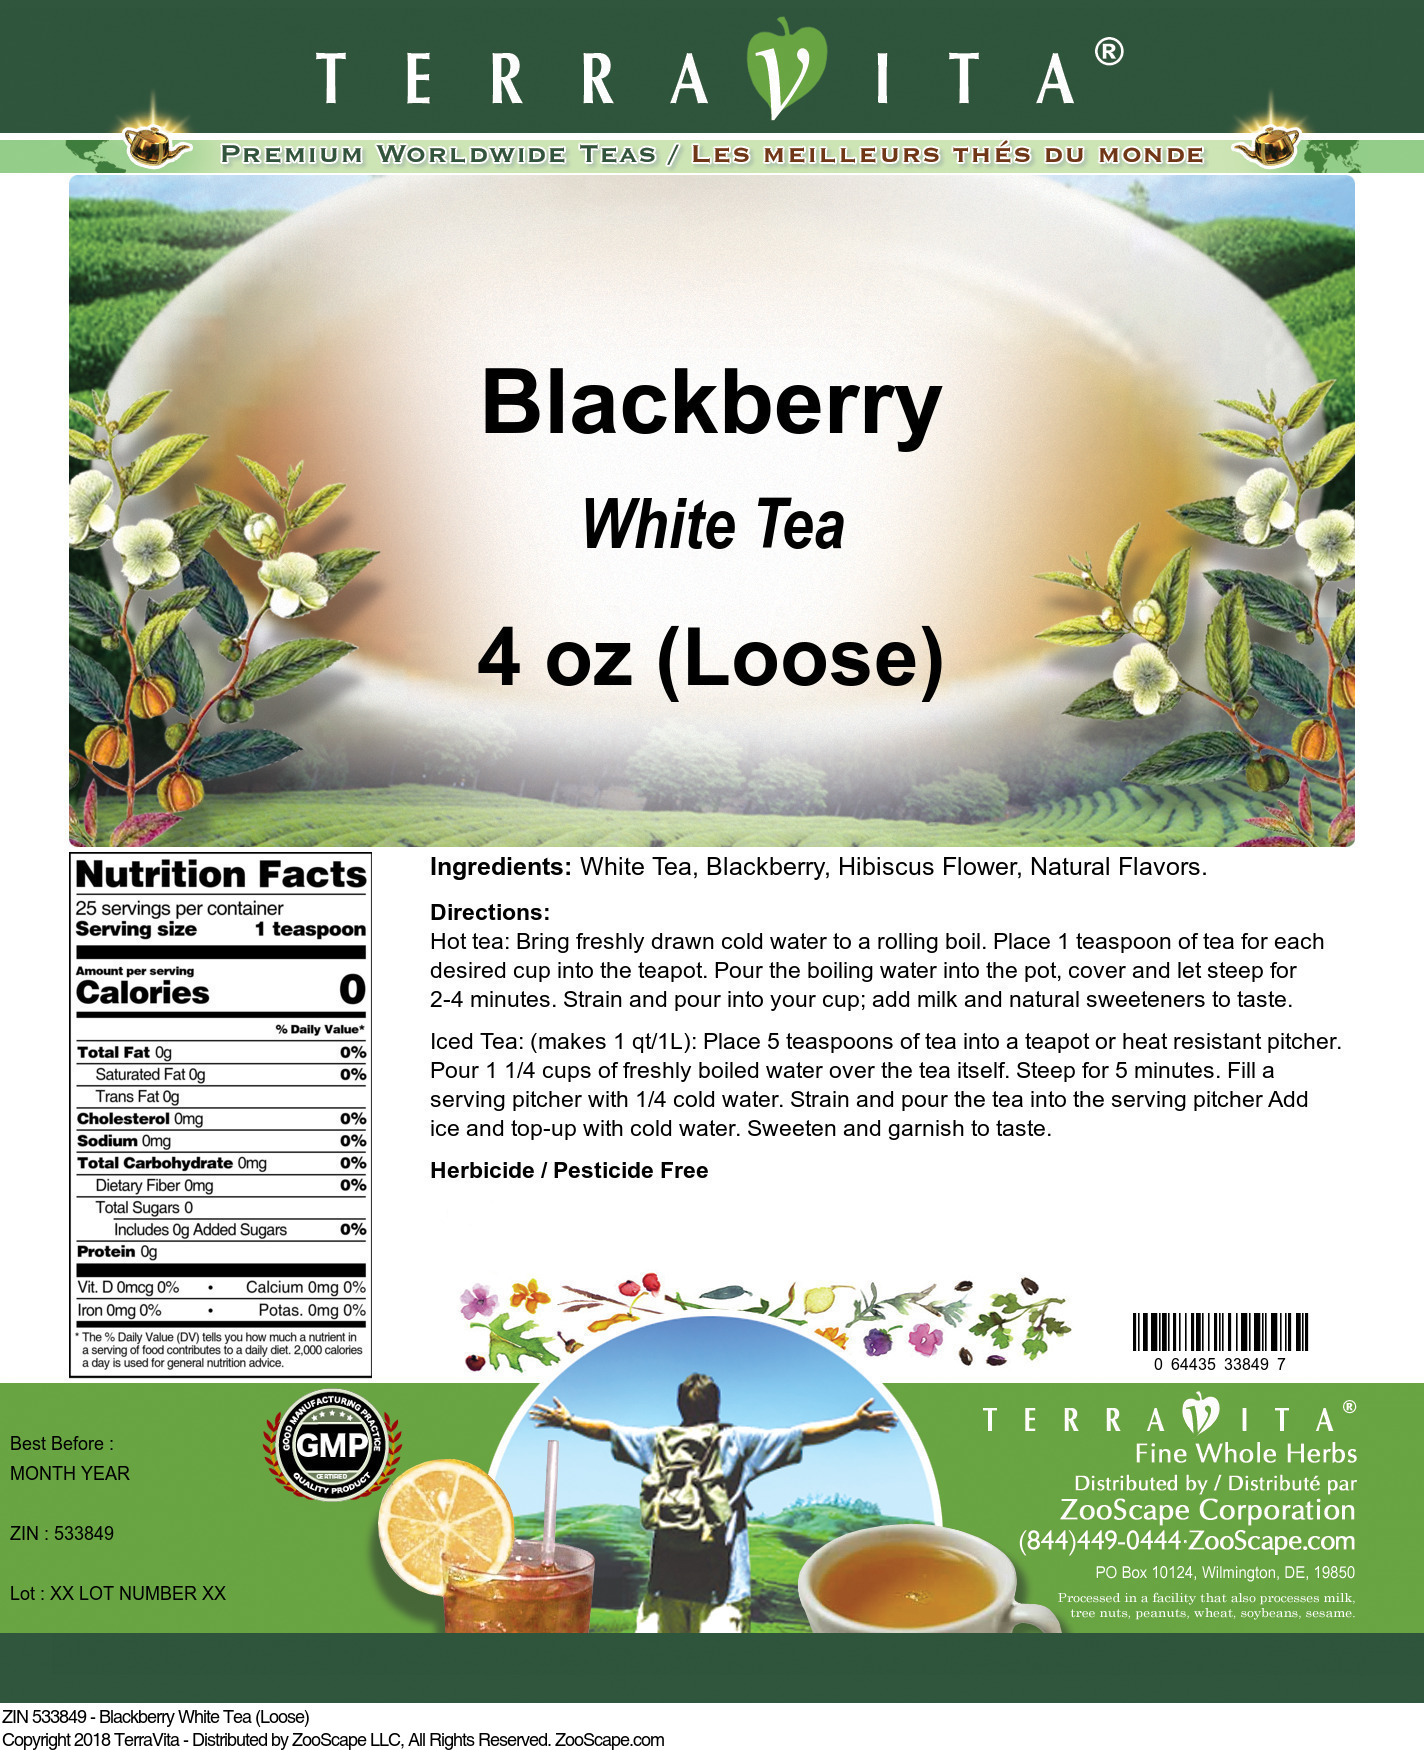 Blackberry White Tea